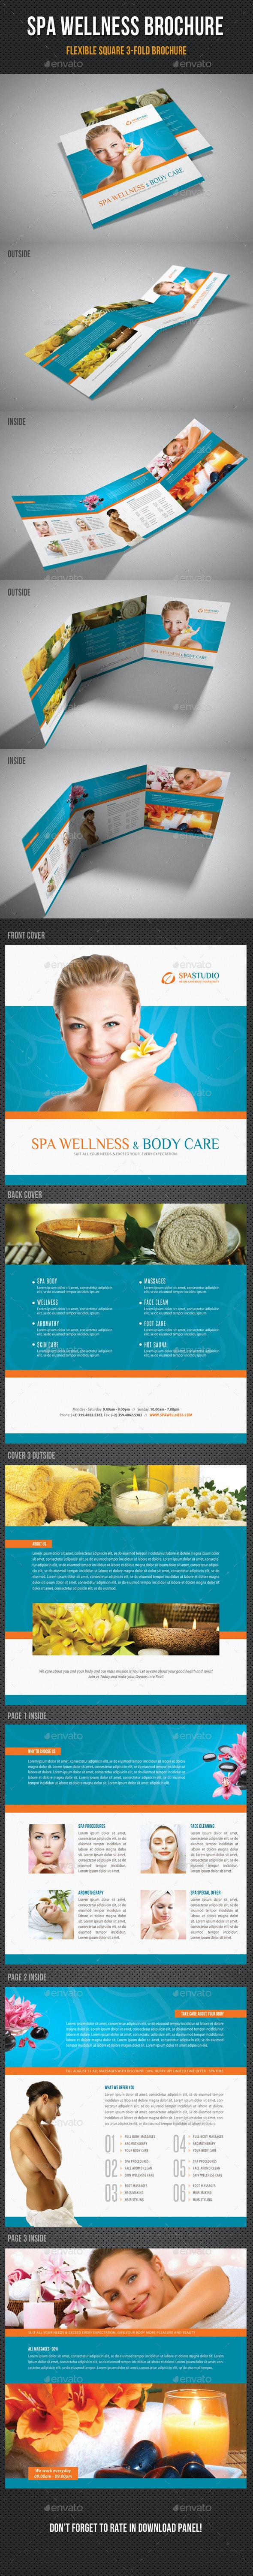 Spa Wellness Square 3-Fold Brochure 01 - Corporate Brochures